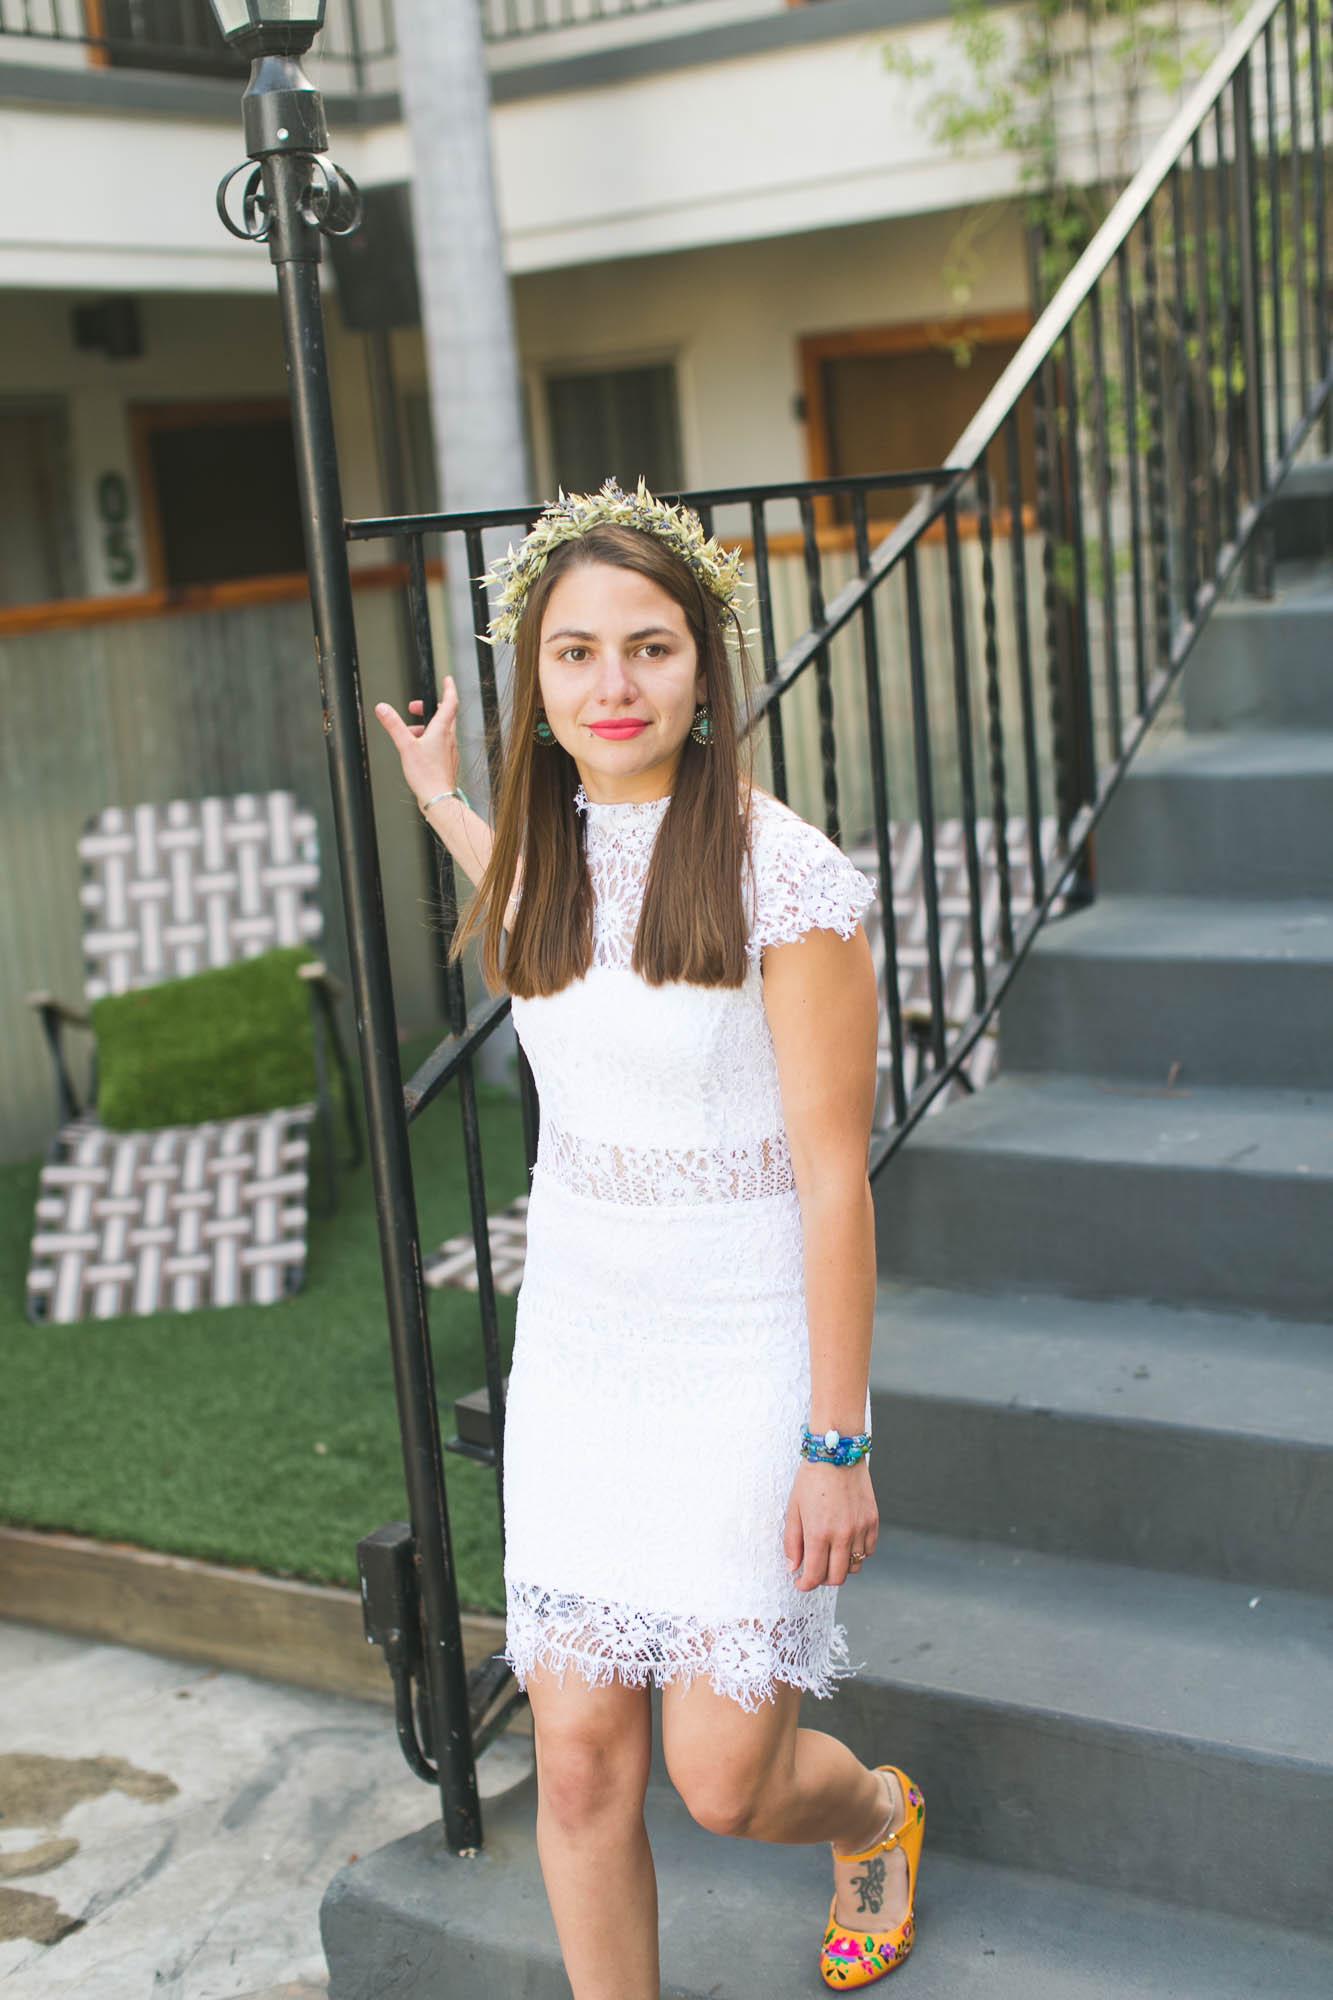 shewanders.wedding.photography007.jpg.photography007.jpg